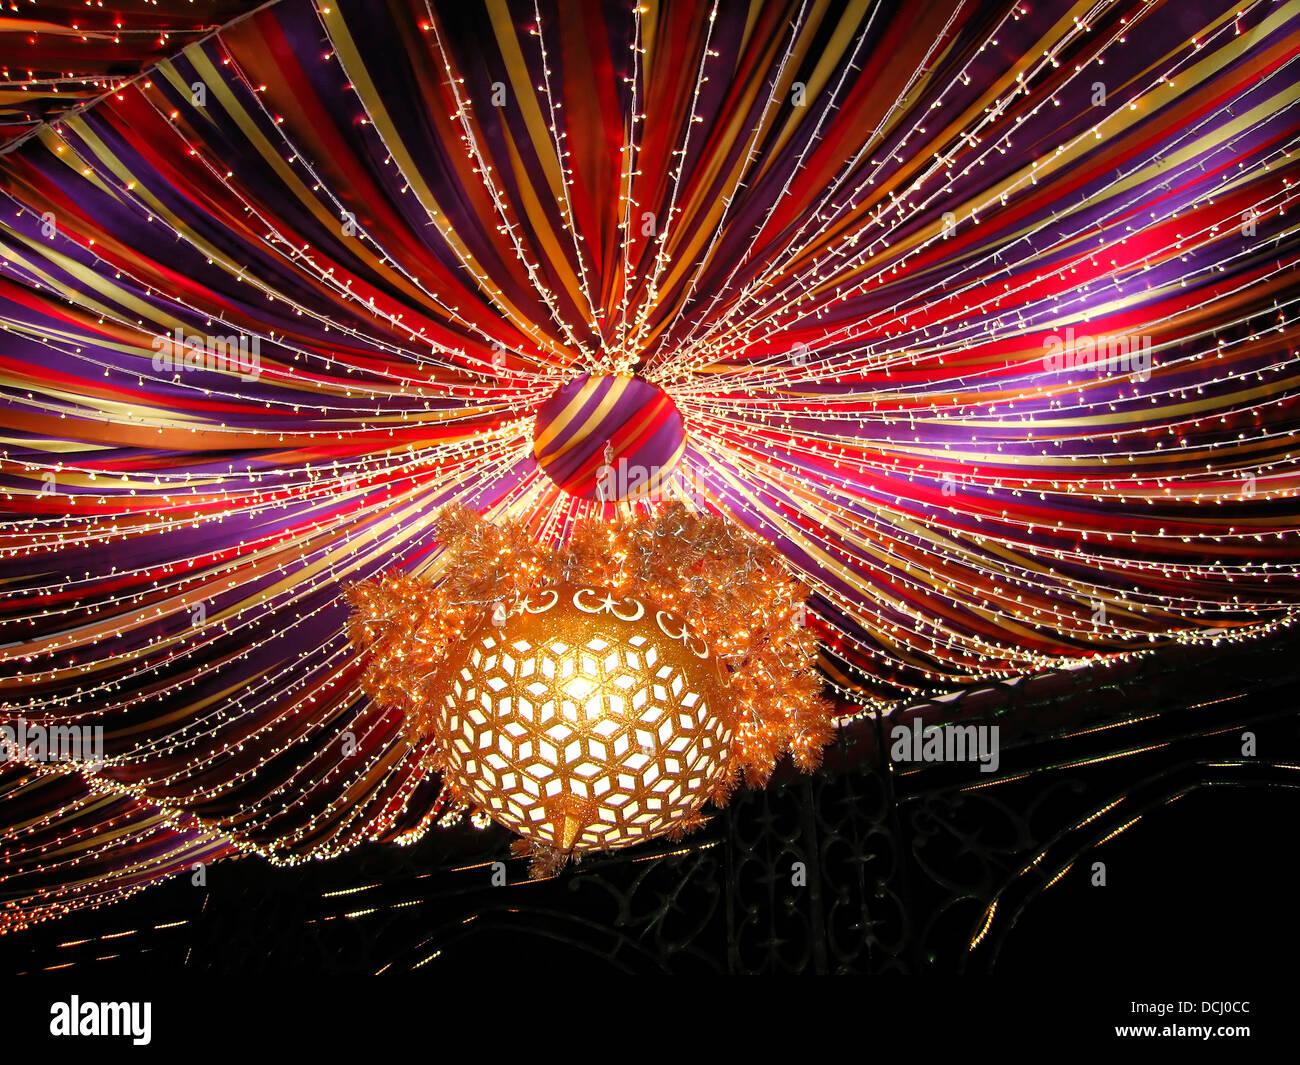 Christmas Decoration X-mas Ribbons Celebration Glowing Lights,December 25 - Stock Image